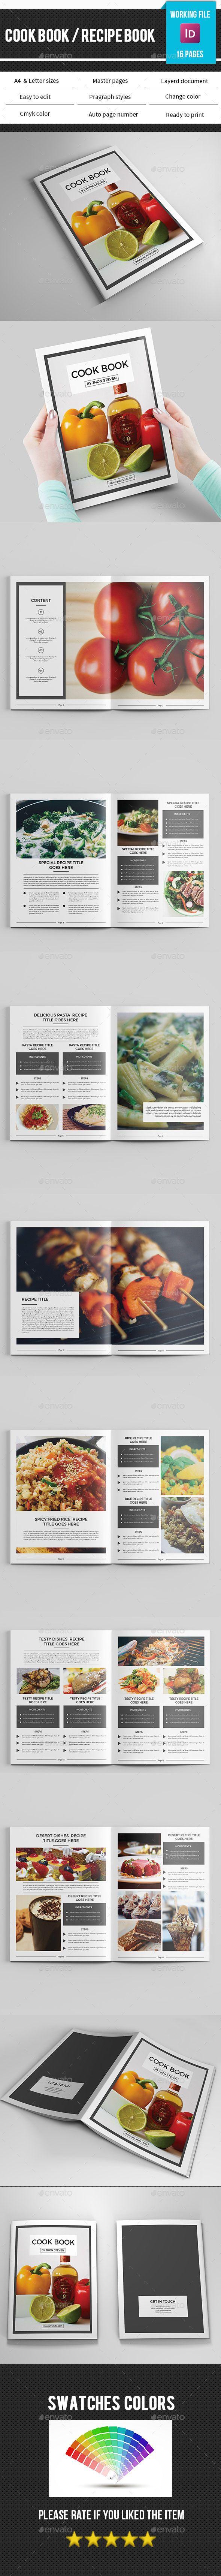 Cook Book/Recipe Book Template InDesign INDD. Download here: http://graphicriver.net/item/cook-bookrecipe-book-template/16130411?ref=ksioks